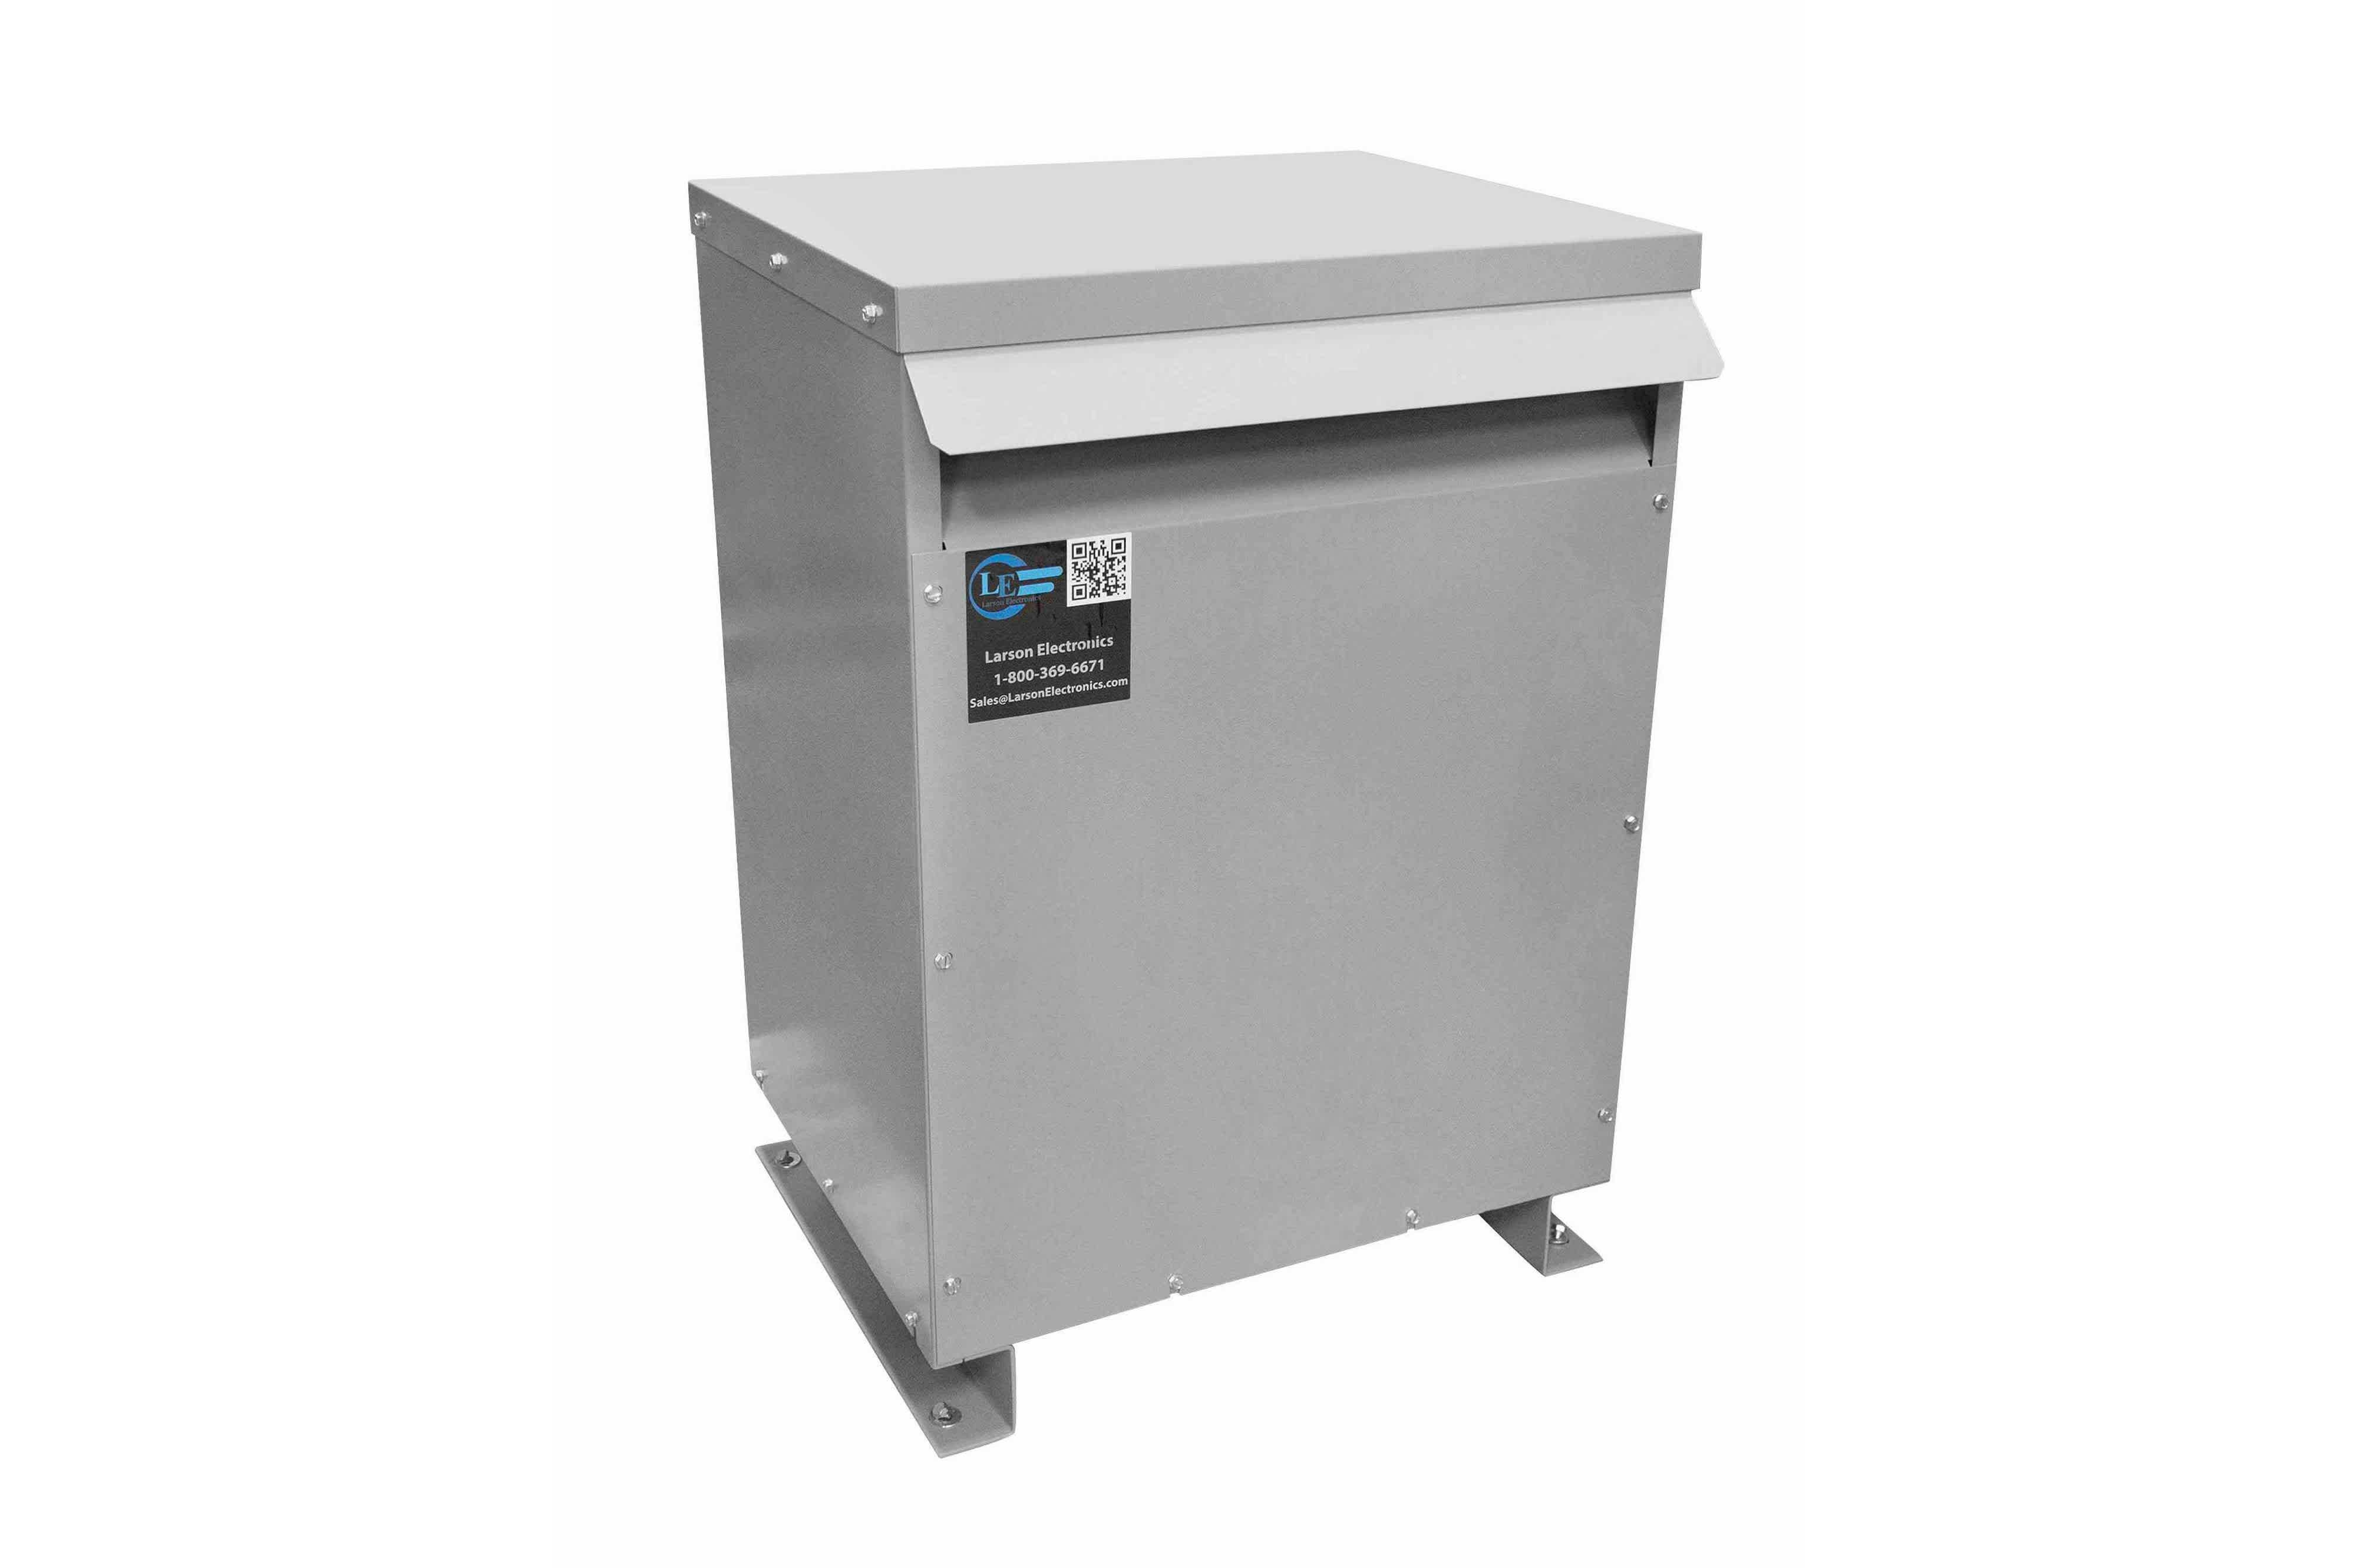 110 kVA 3PH Isolation Transformer, 208V Wye Primary, 380Y/220 Wye-N Secondary, N3R, Ventilated, 60 Hz